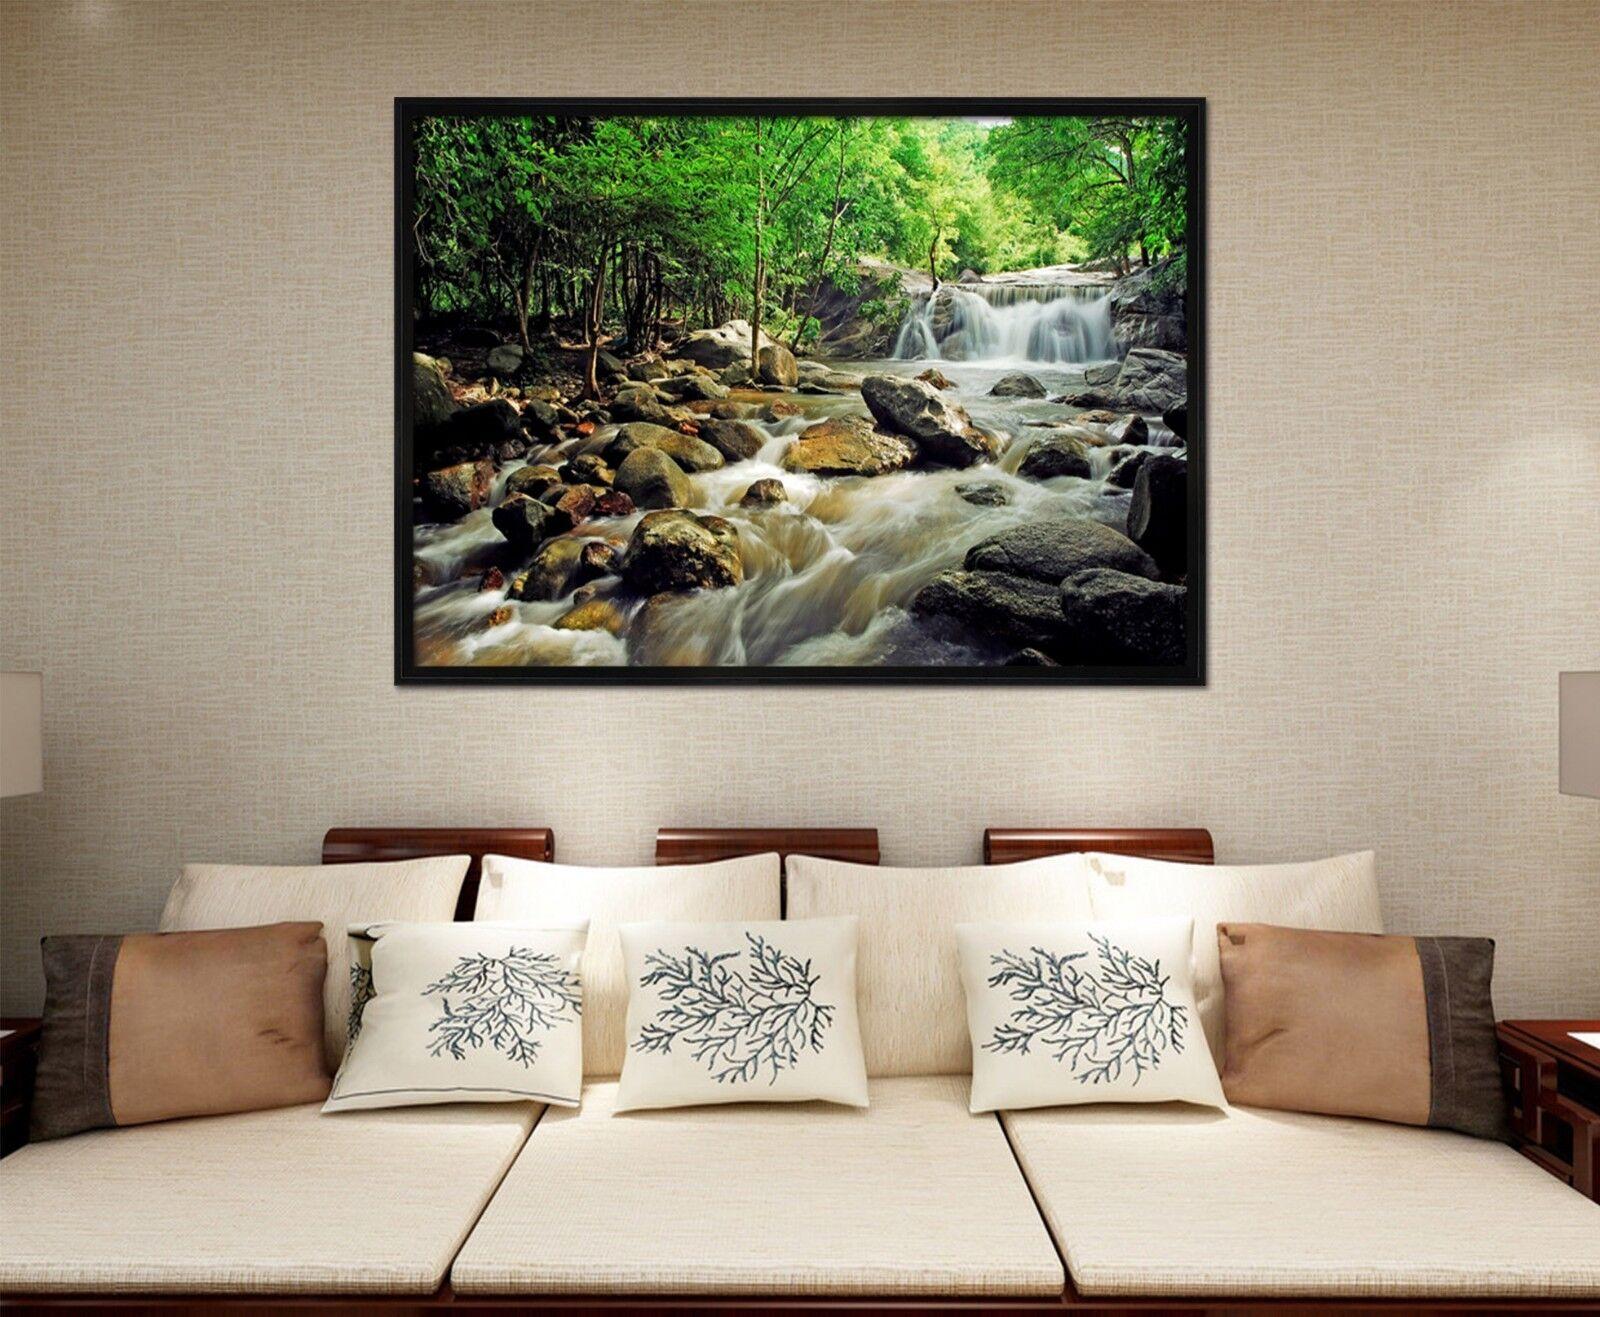 3D Stone Water 6 Framed Poster Home Decor Print Painting Art AJ WALLPAPER